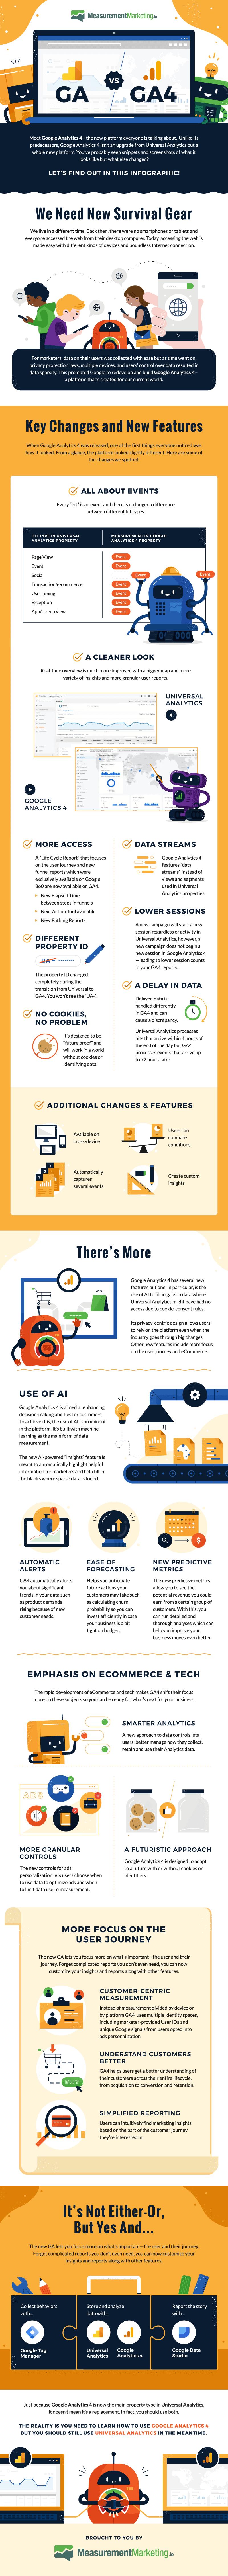 google-analytics-4-infographic